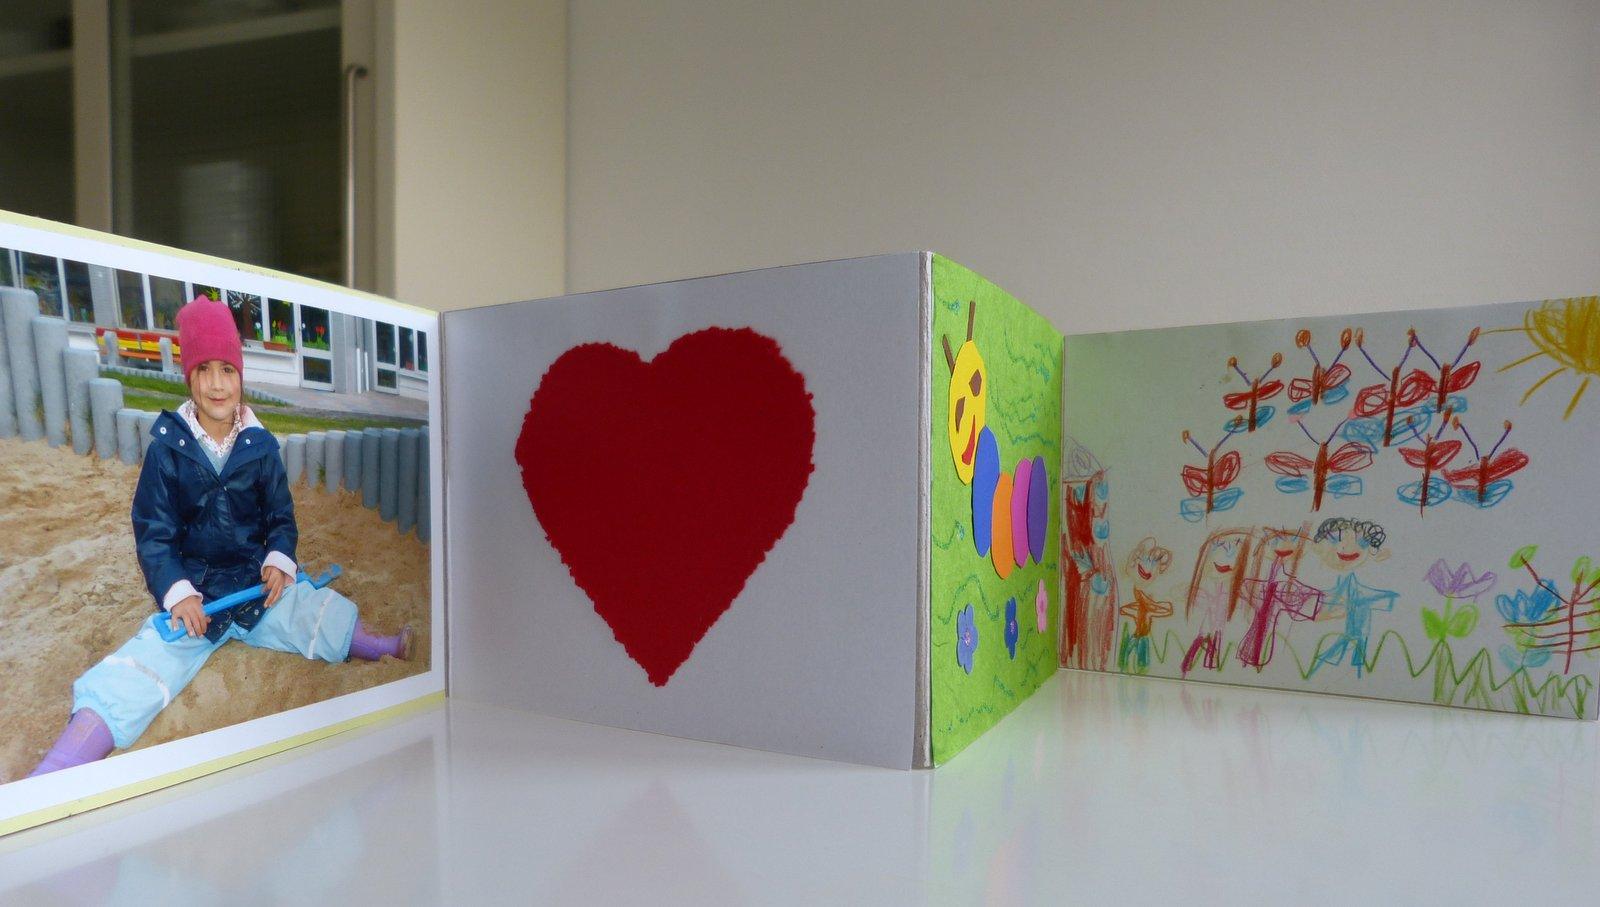 Basteln muttertagsgeschenke for Muttertagsgeschenke selber basteln